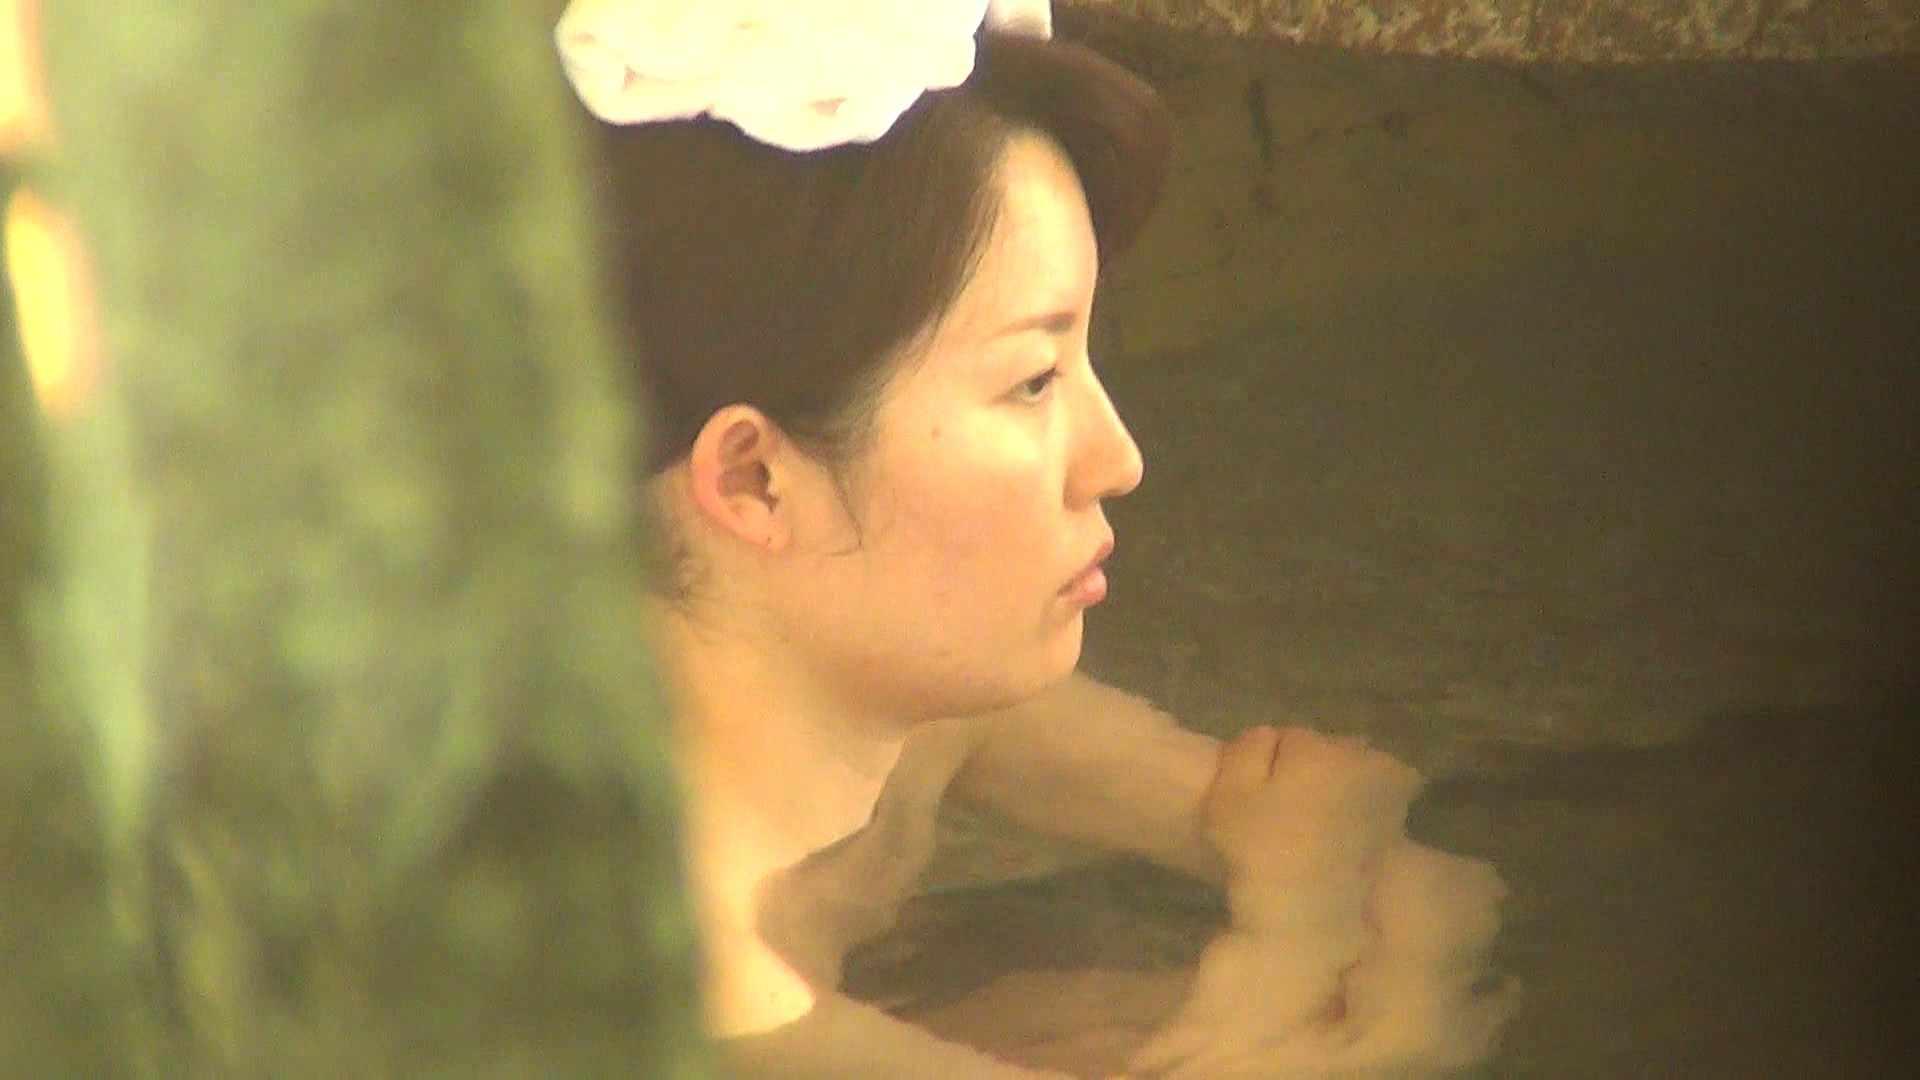 Aquaな露天風呂Vol.301 盗撮  112連発 99